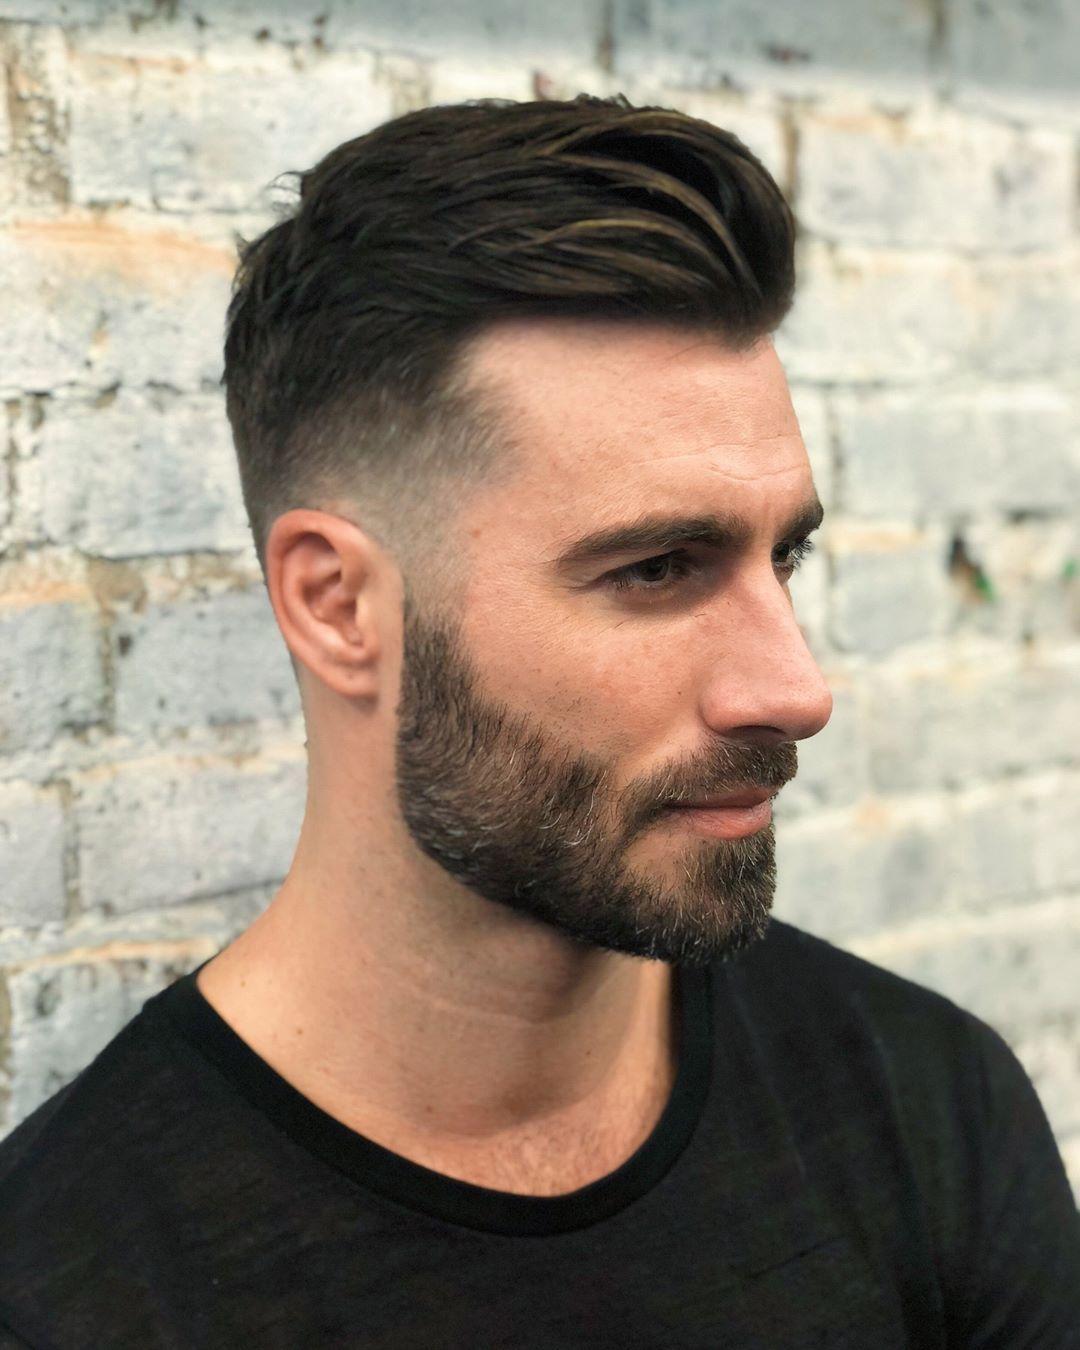 уход за стрижкой и бородой